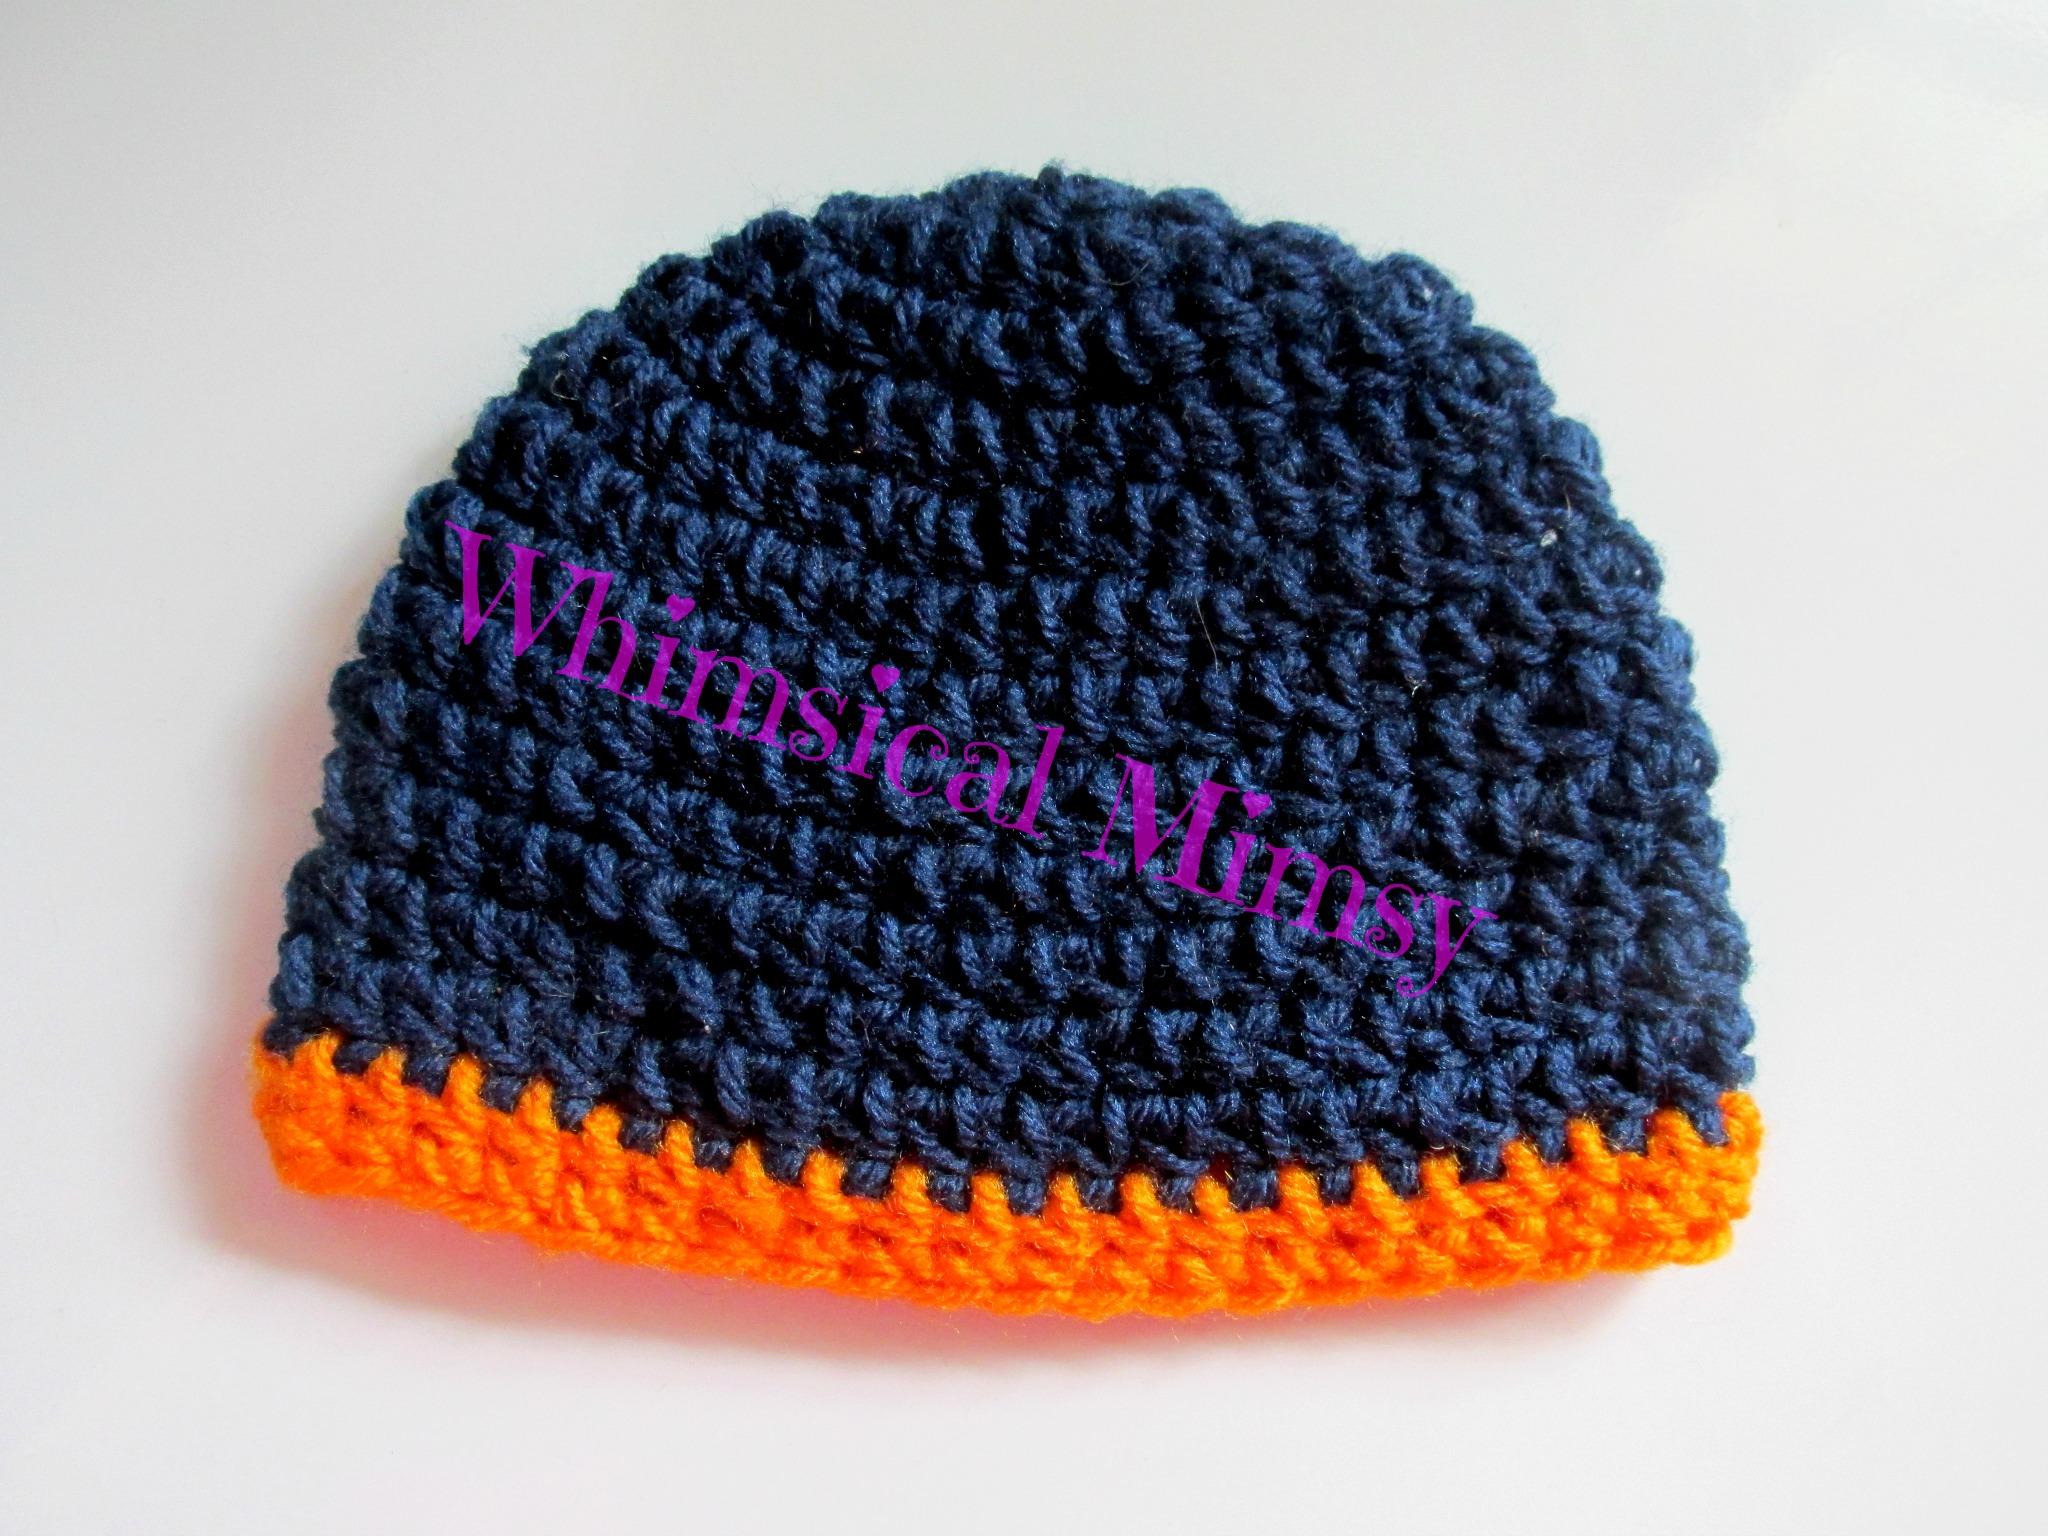 50b52e4d749 ... Crochet Auburn Football Inspired Newborn Hat and Diaper Cover Set Photo  Prop - Thumbnail 4